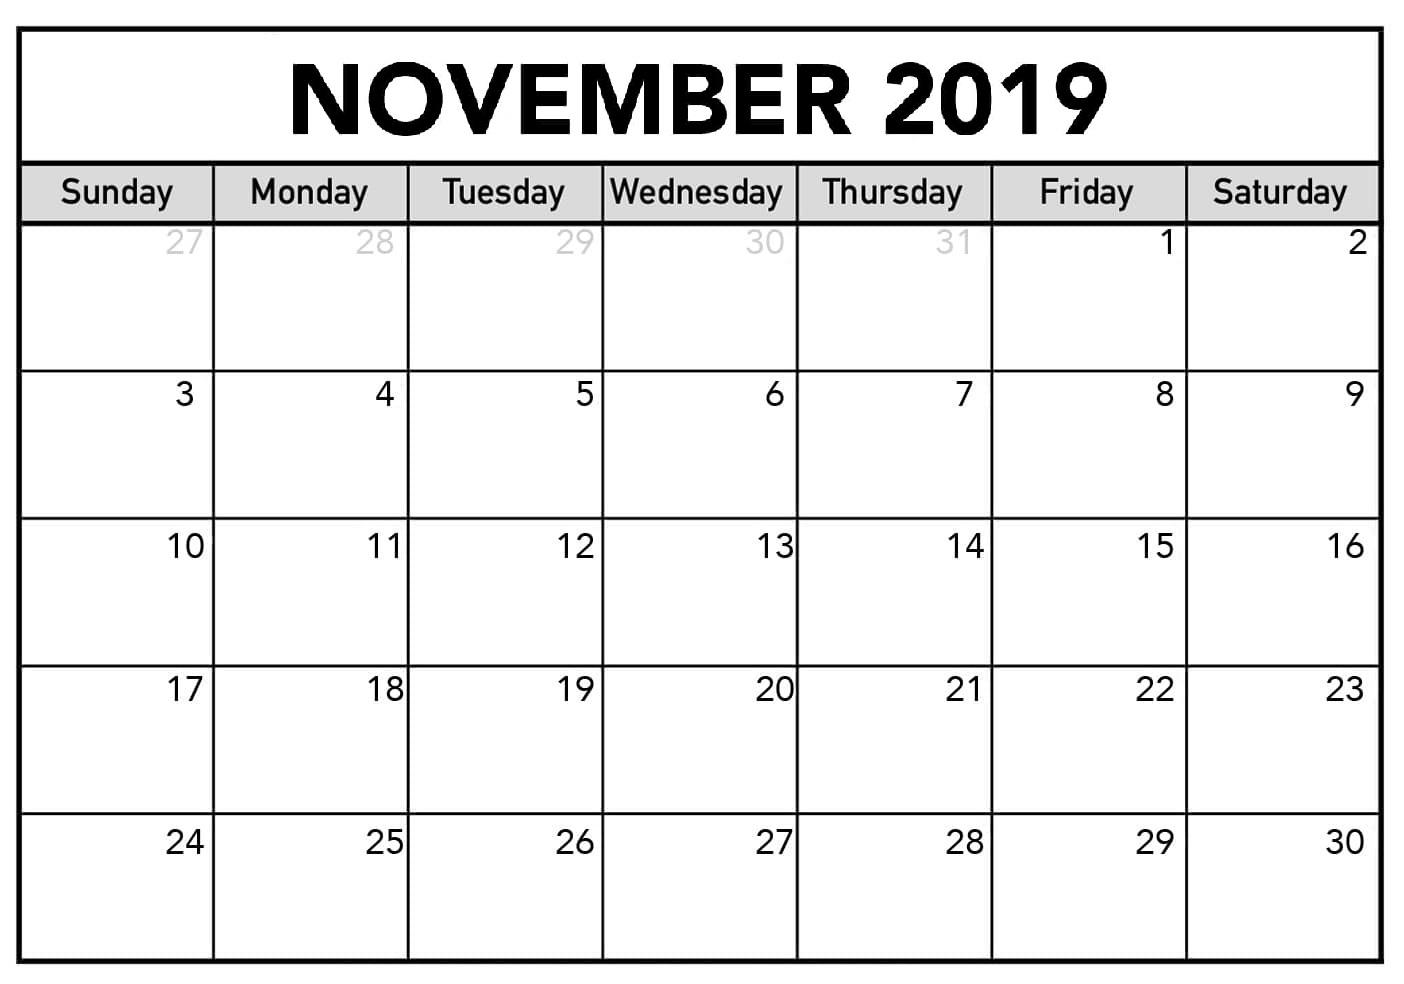 November 2019 Calendar PrintableNovember 2019 Calendar Printable